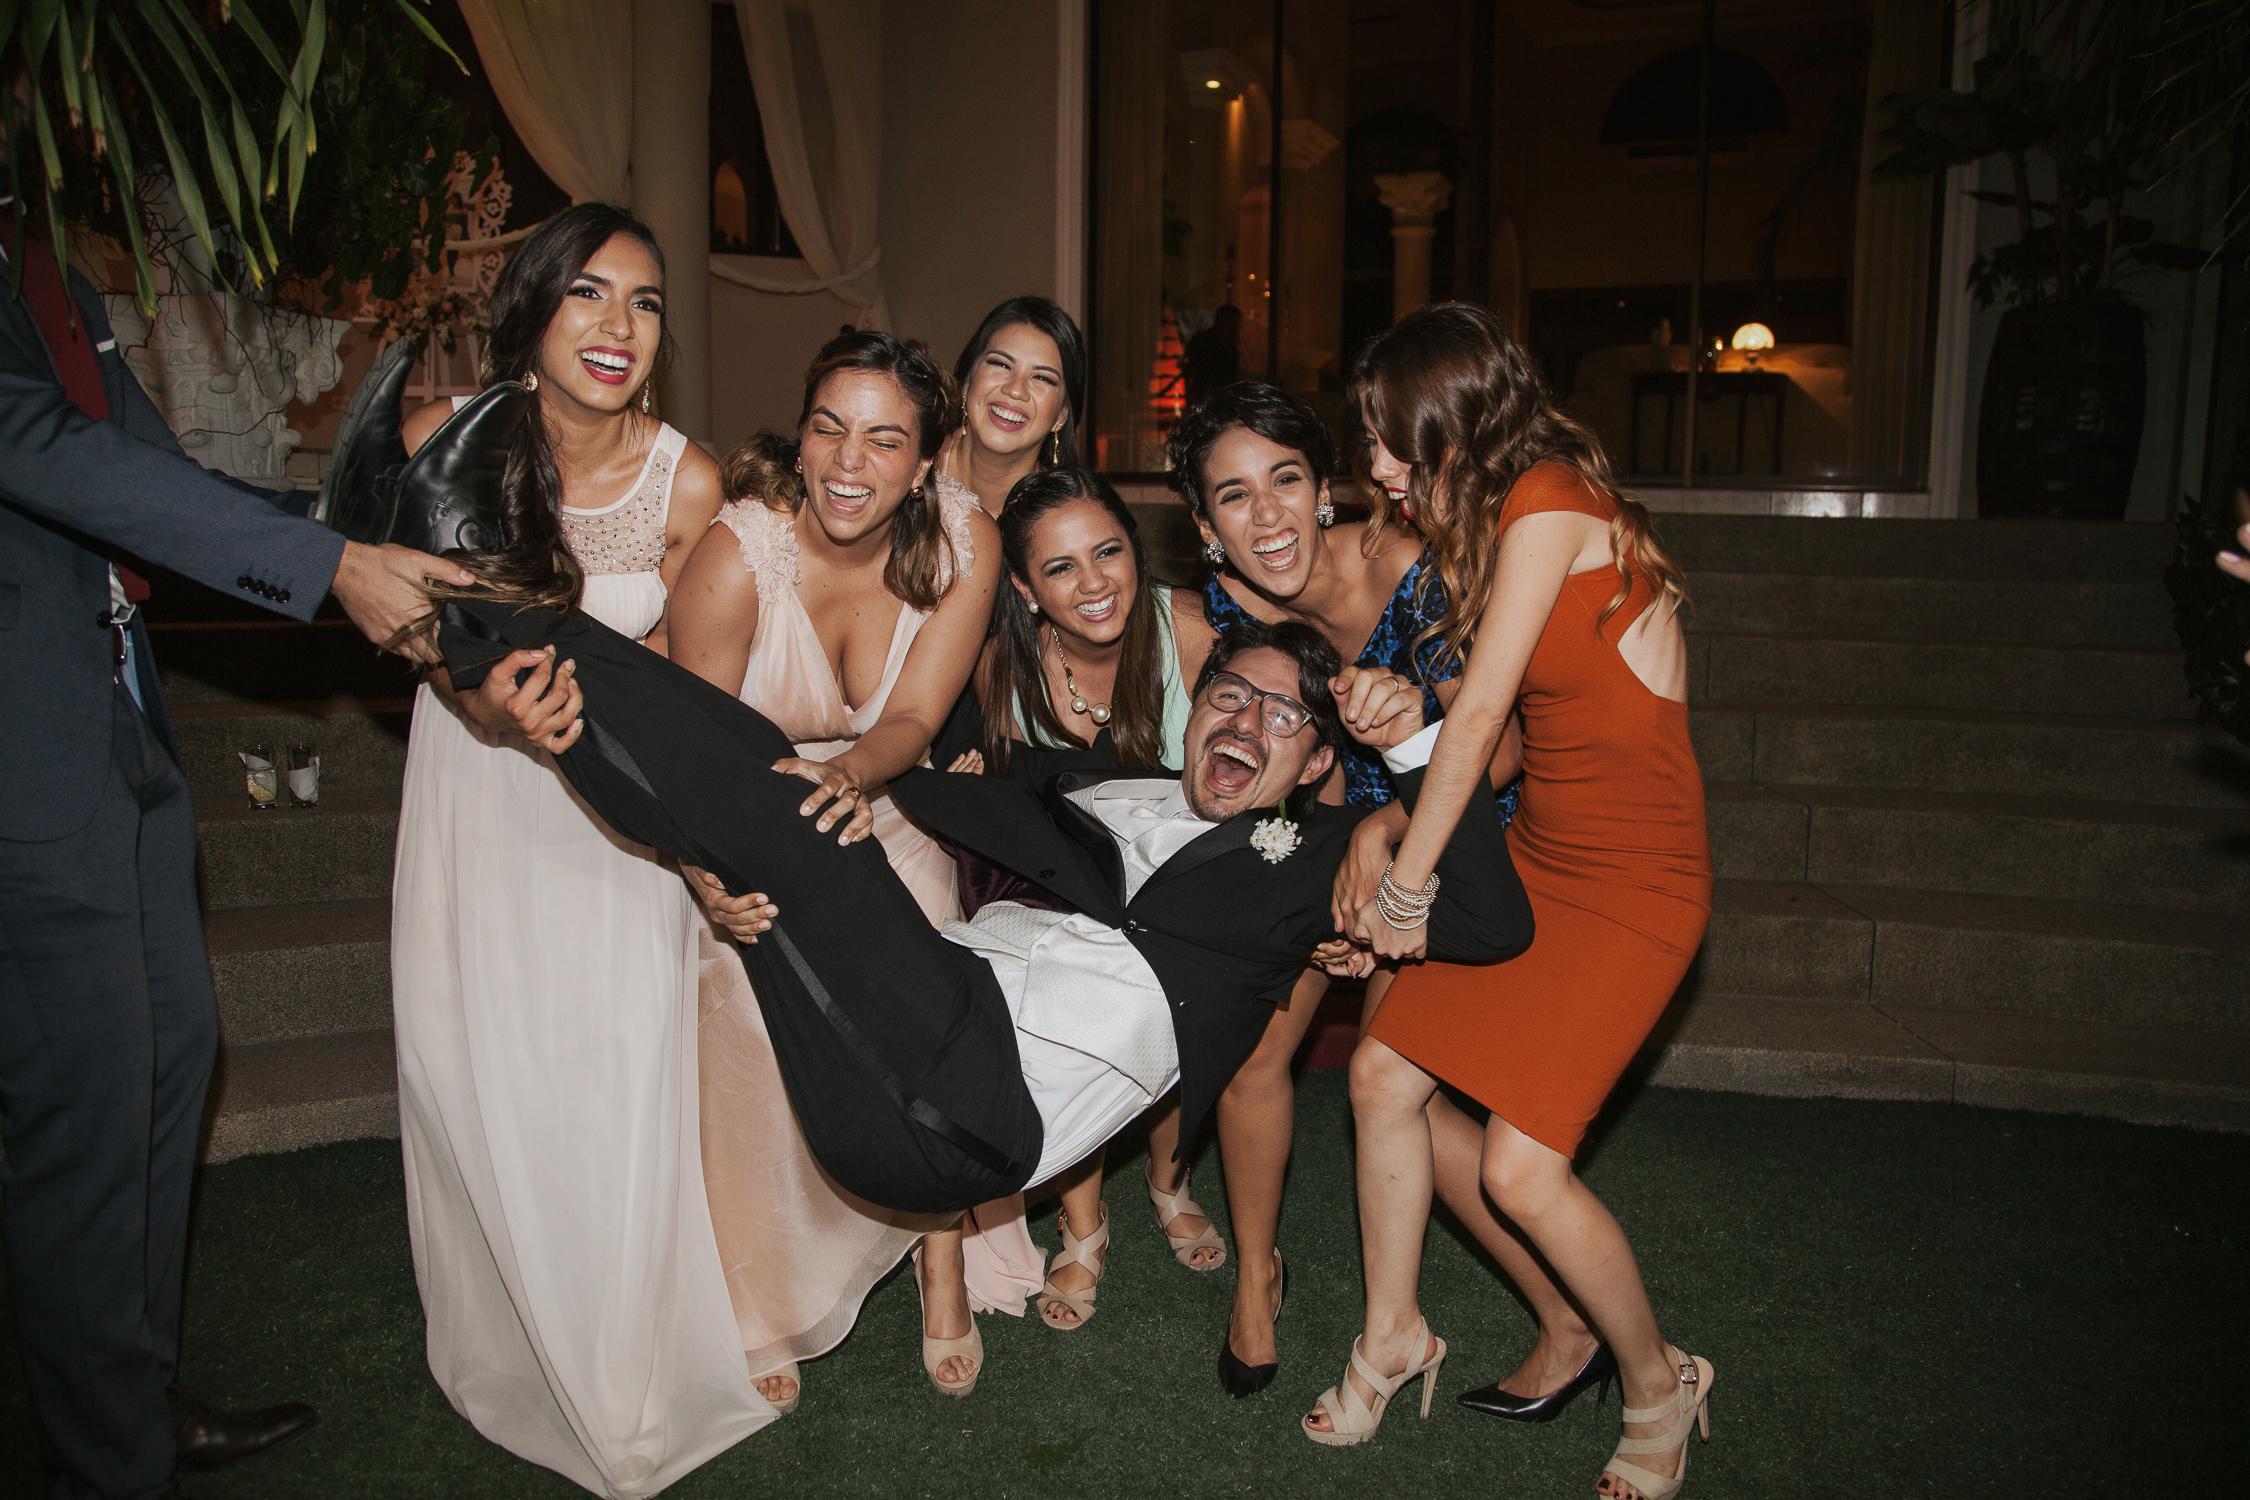 Michelle-Agurto-Fotografia-Bodas-Ecuador-Destination-Wedding-Photographer-Pauli-Edwin-38.JPG